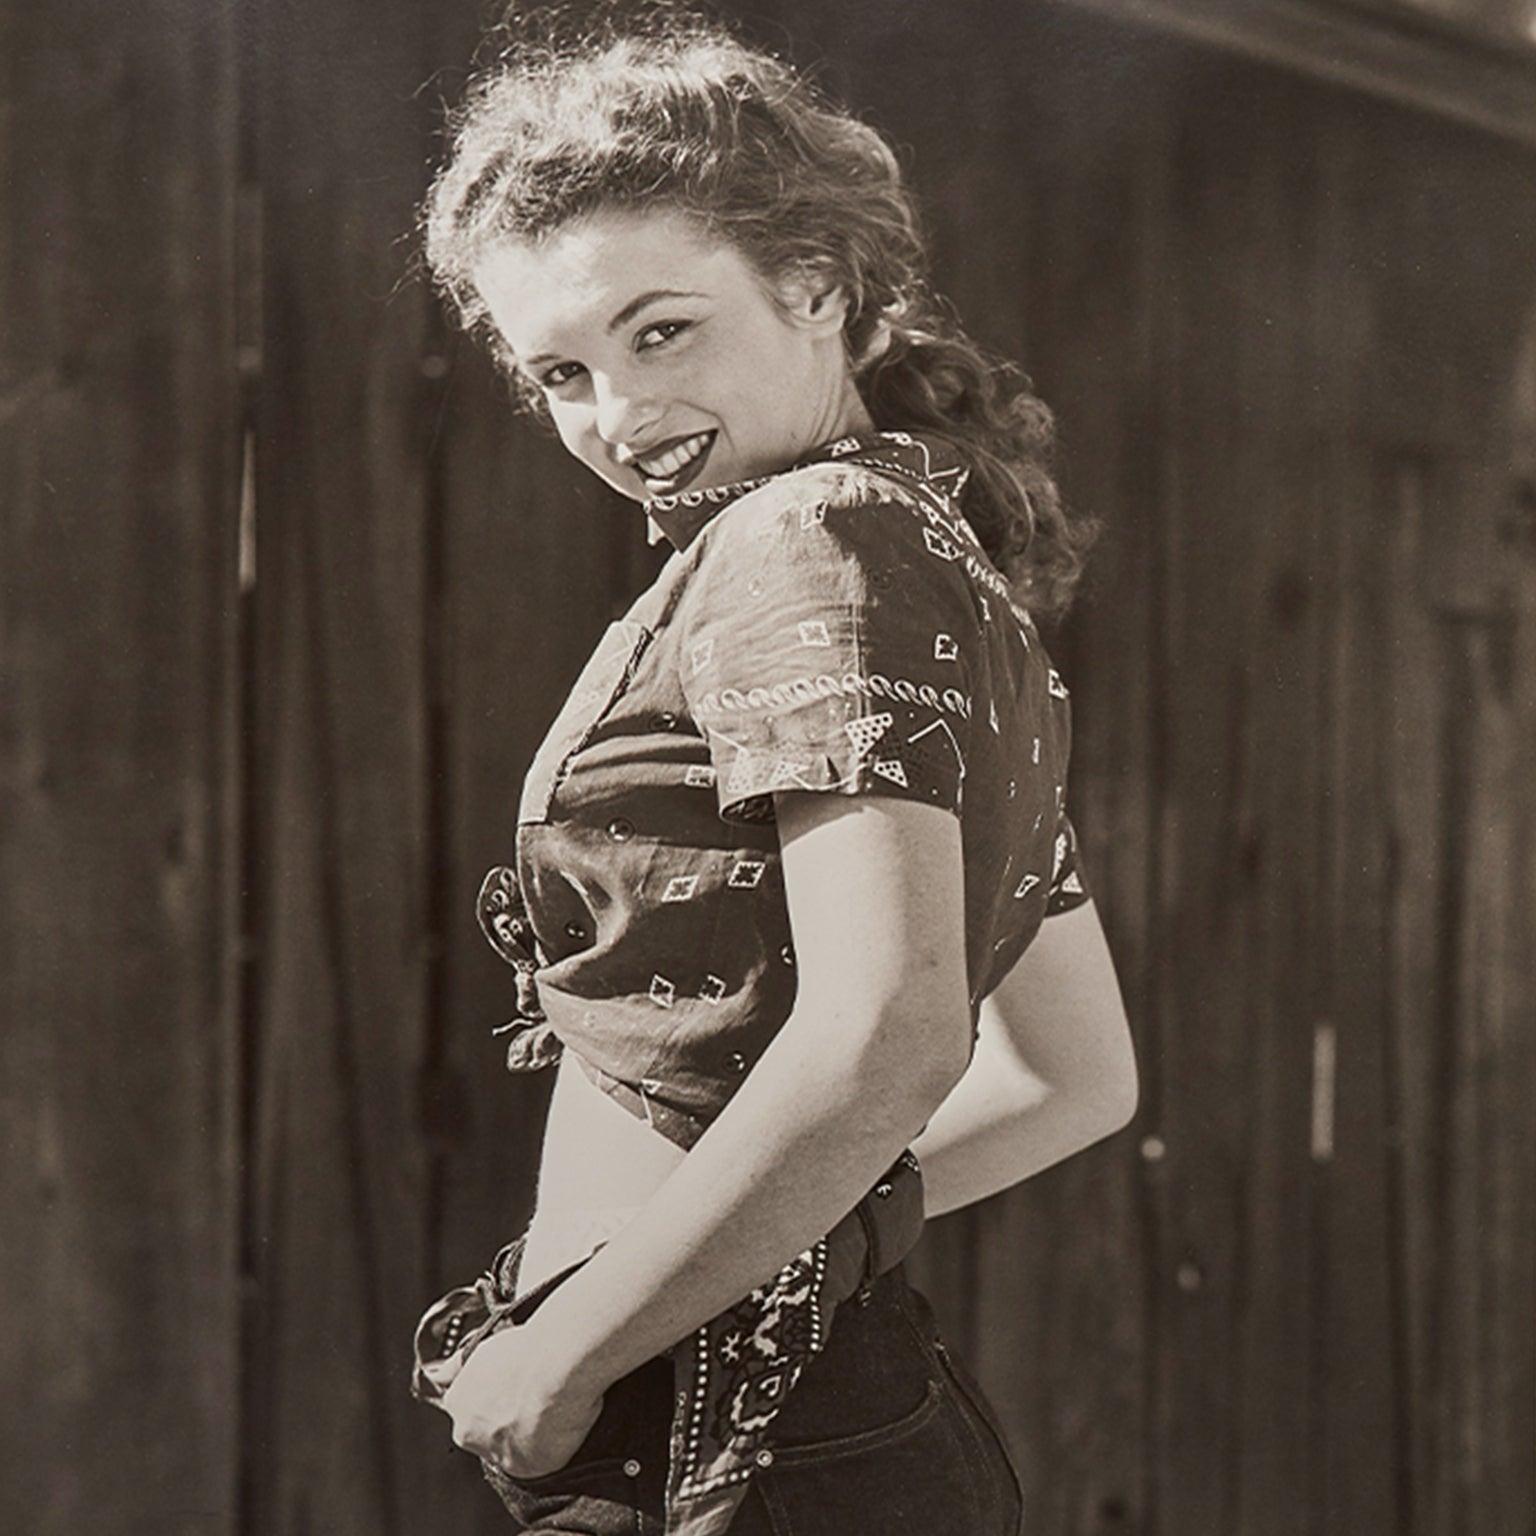 acd07c4760aa Andre de Dienes - Marilyn Monroe